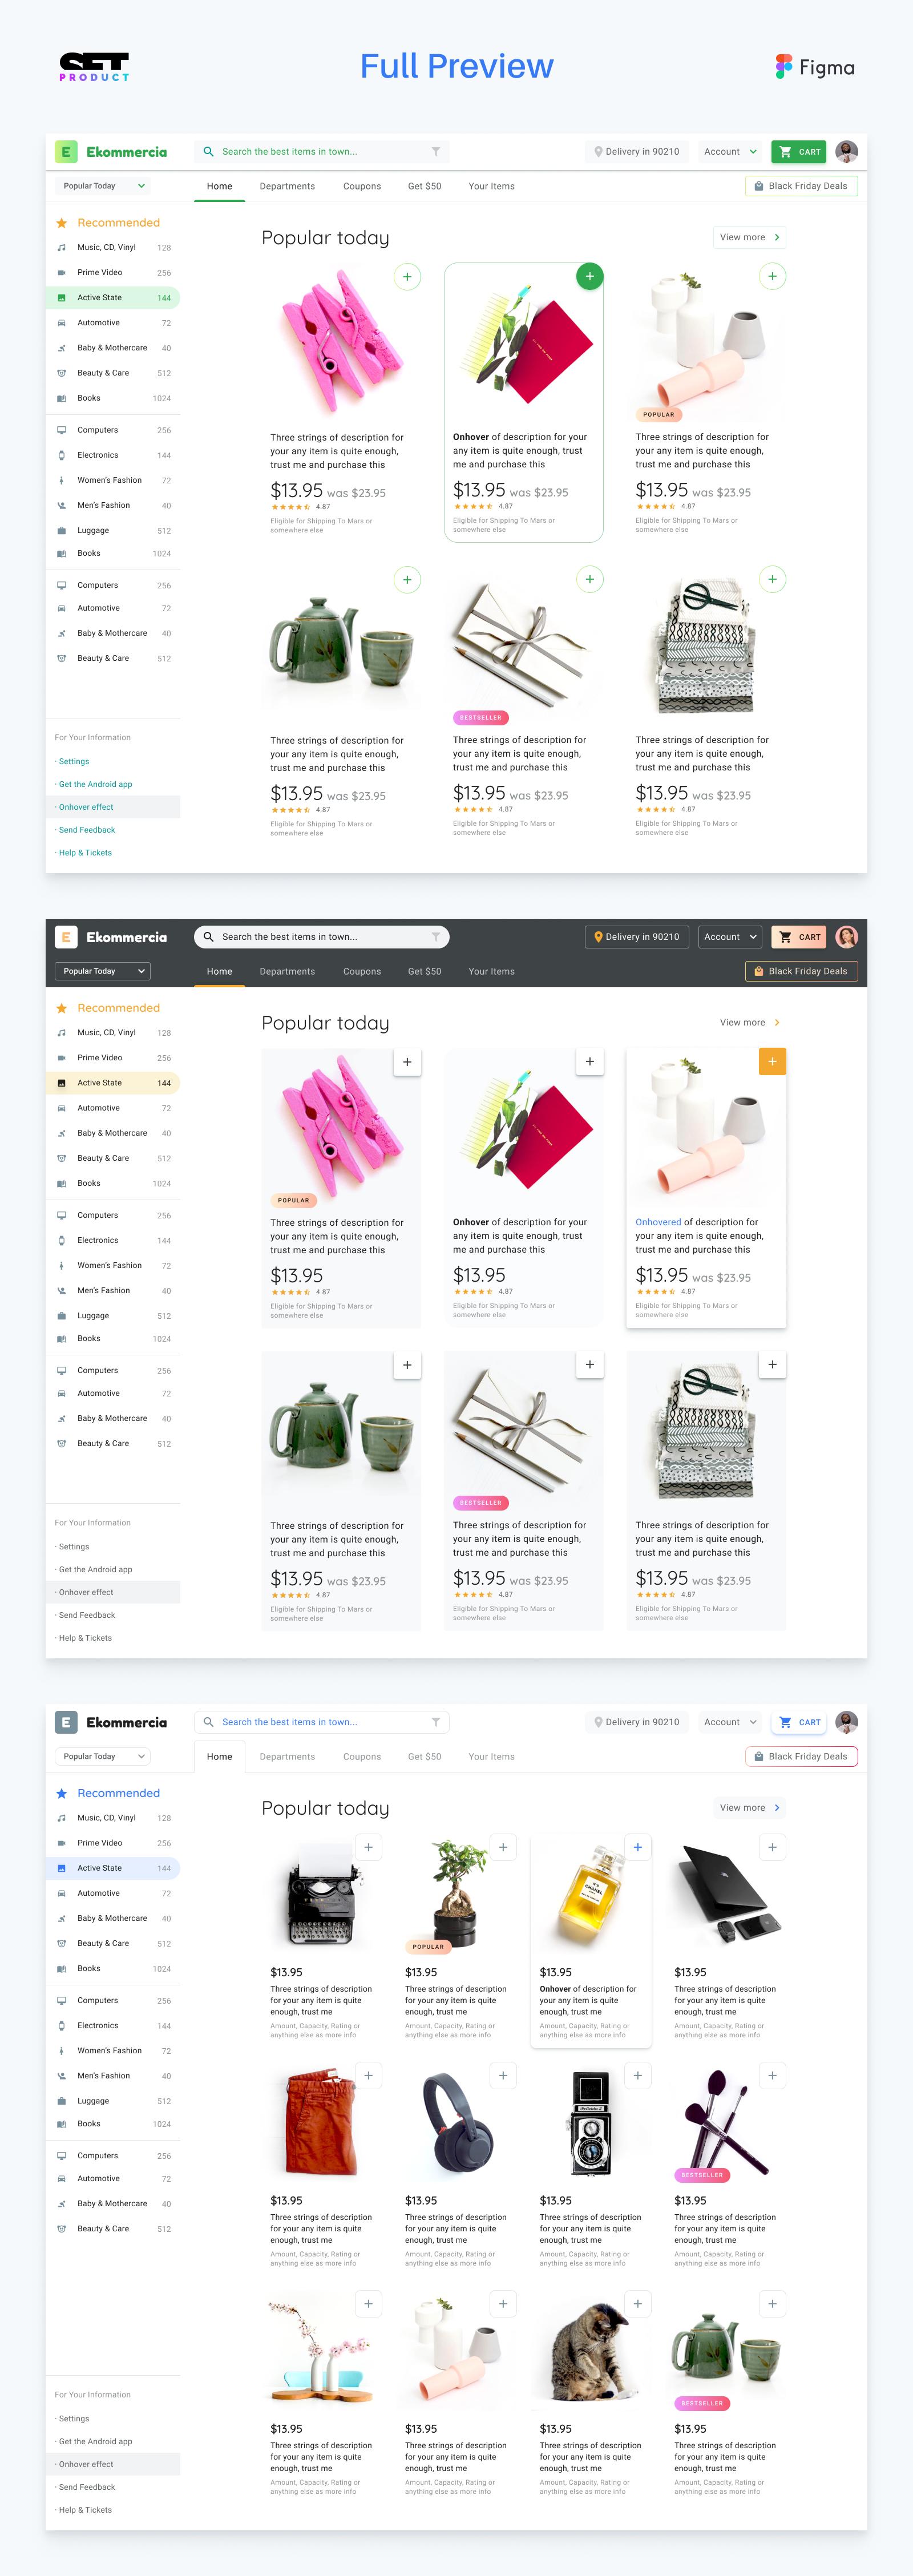 Figma Desktop Templates For Material Design - UpLabs